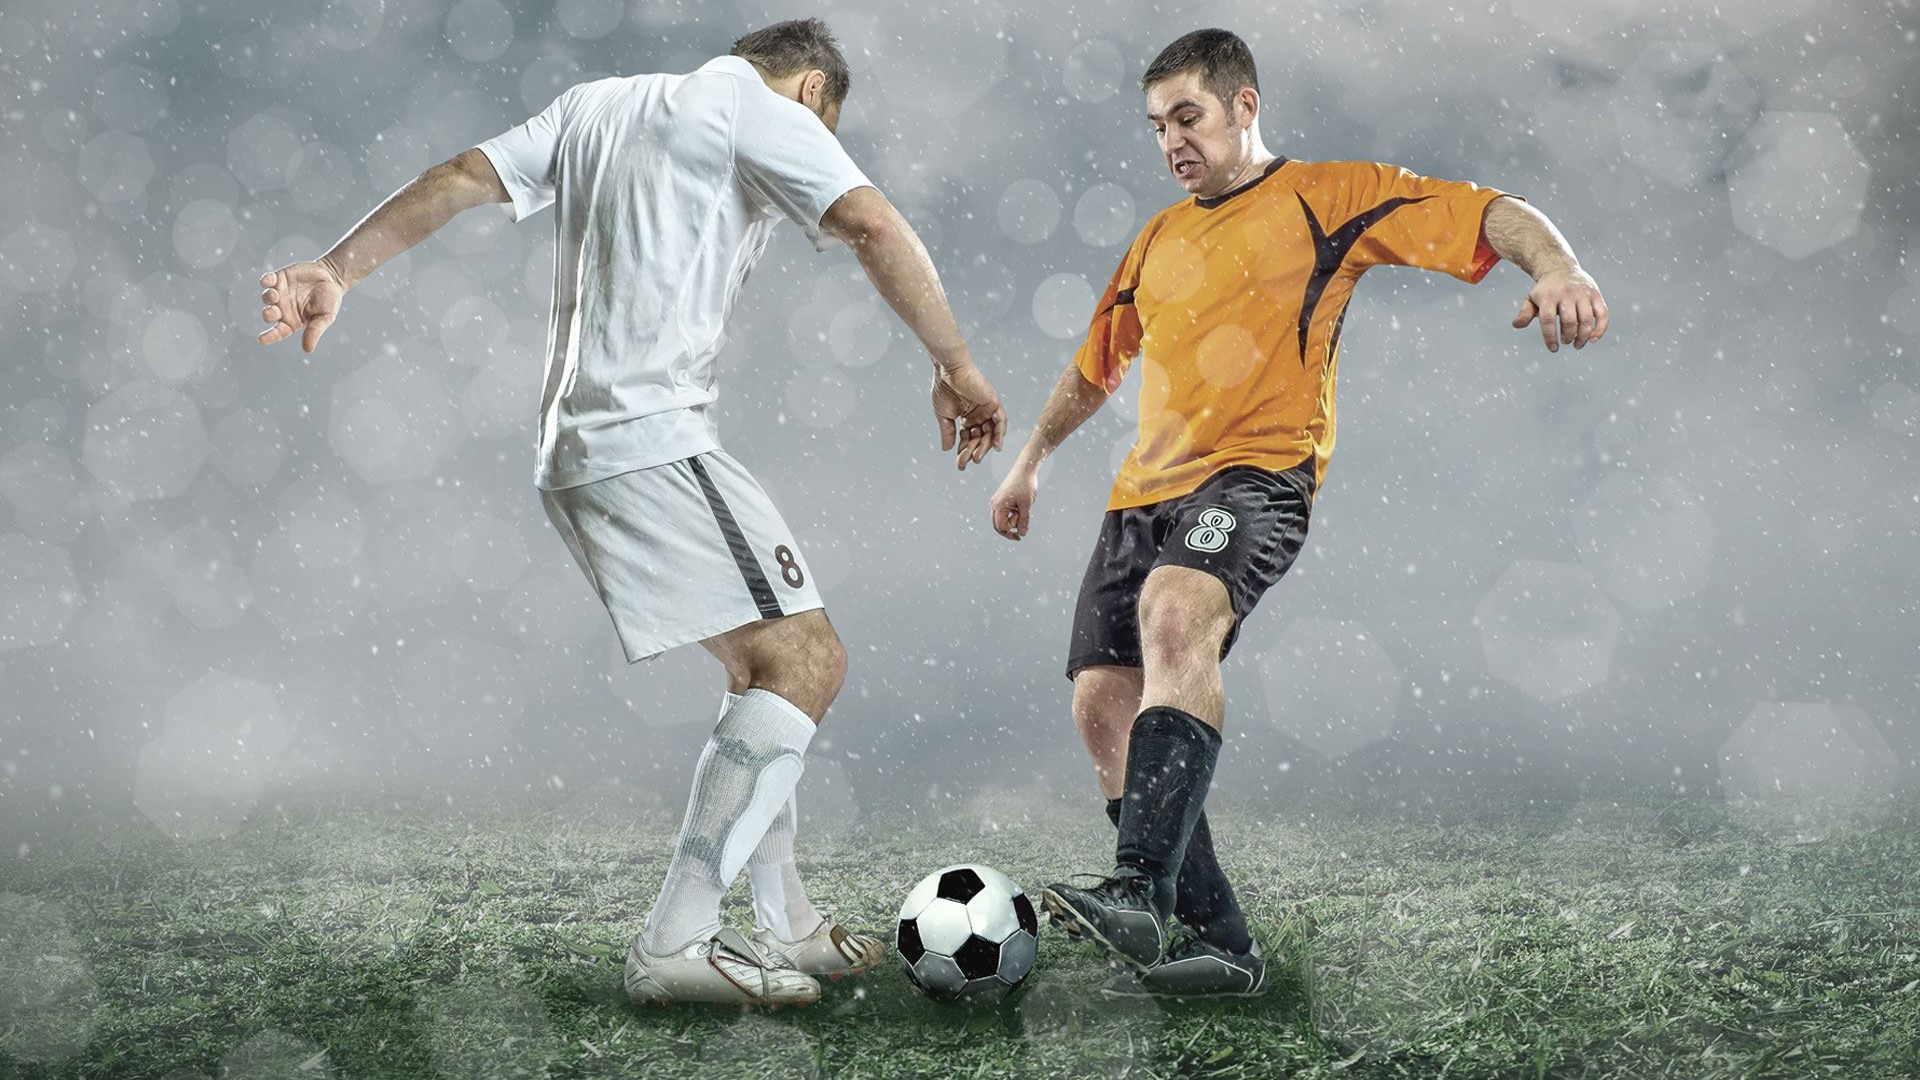 northampton-saints-vs-bristol-rugby-stream-live